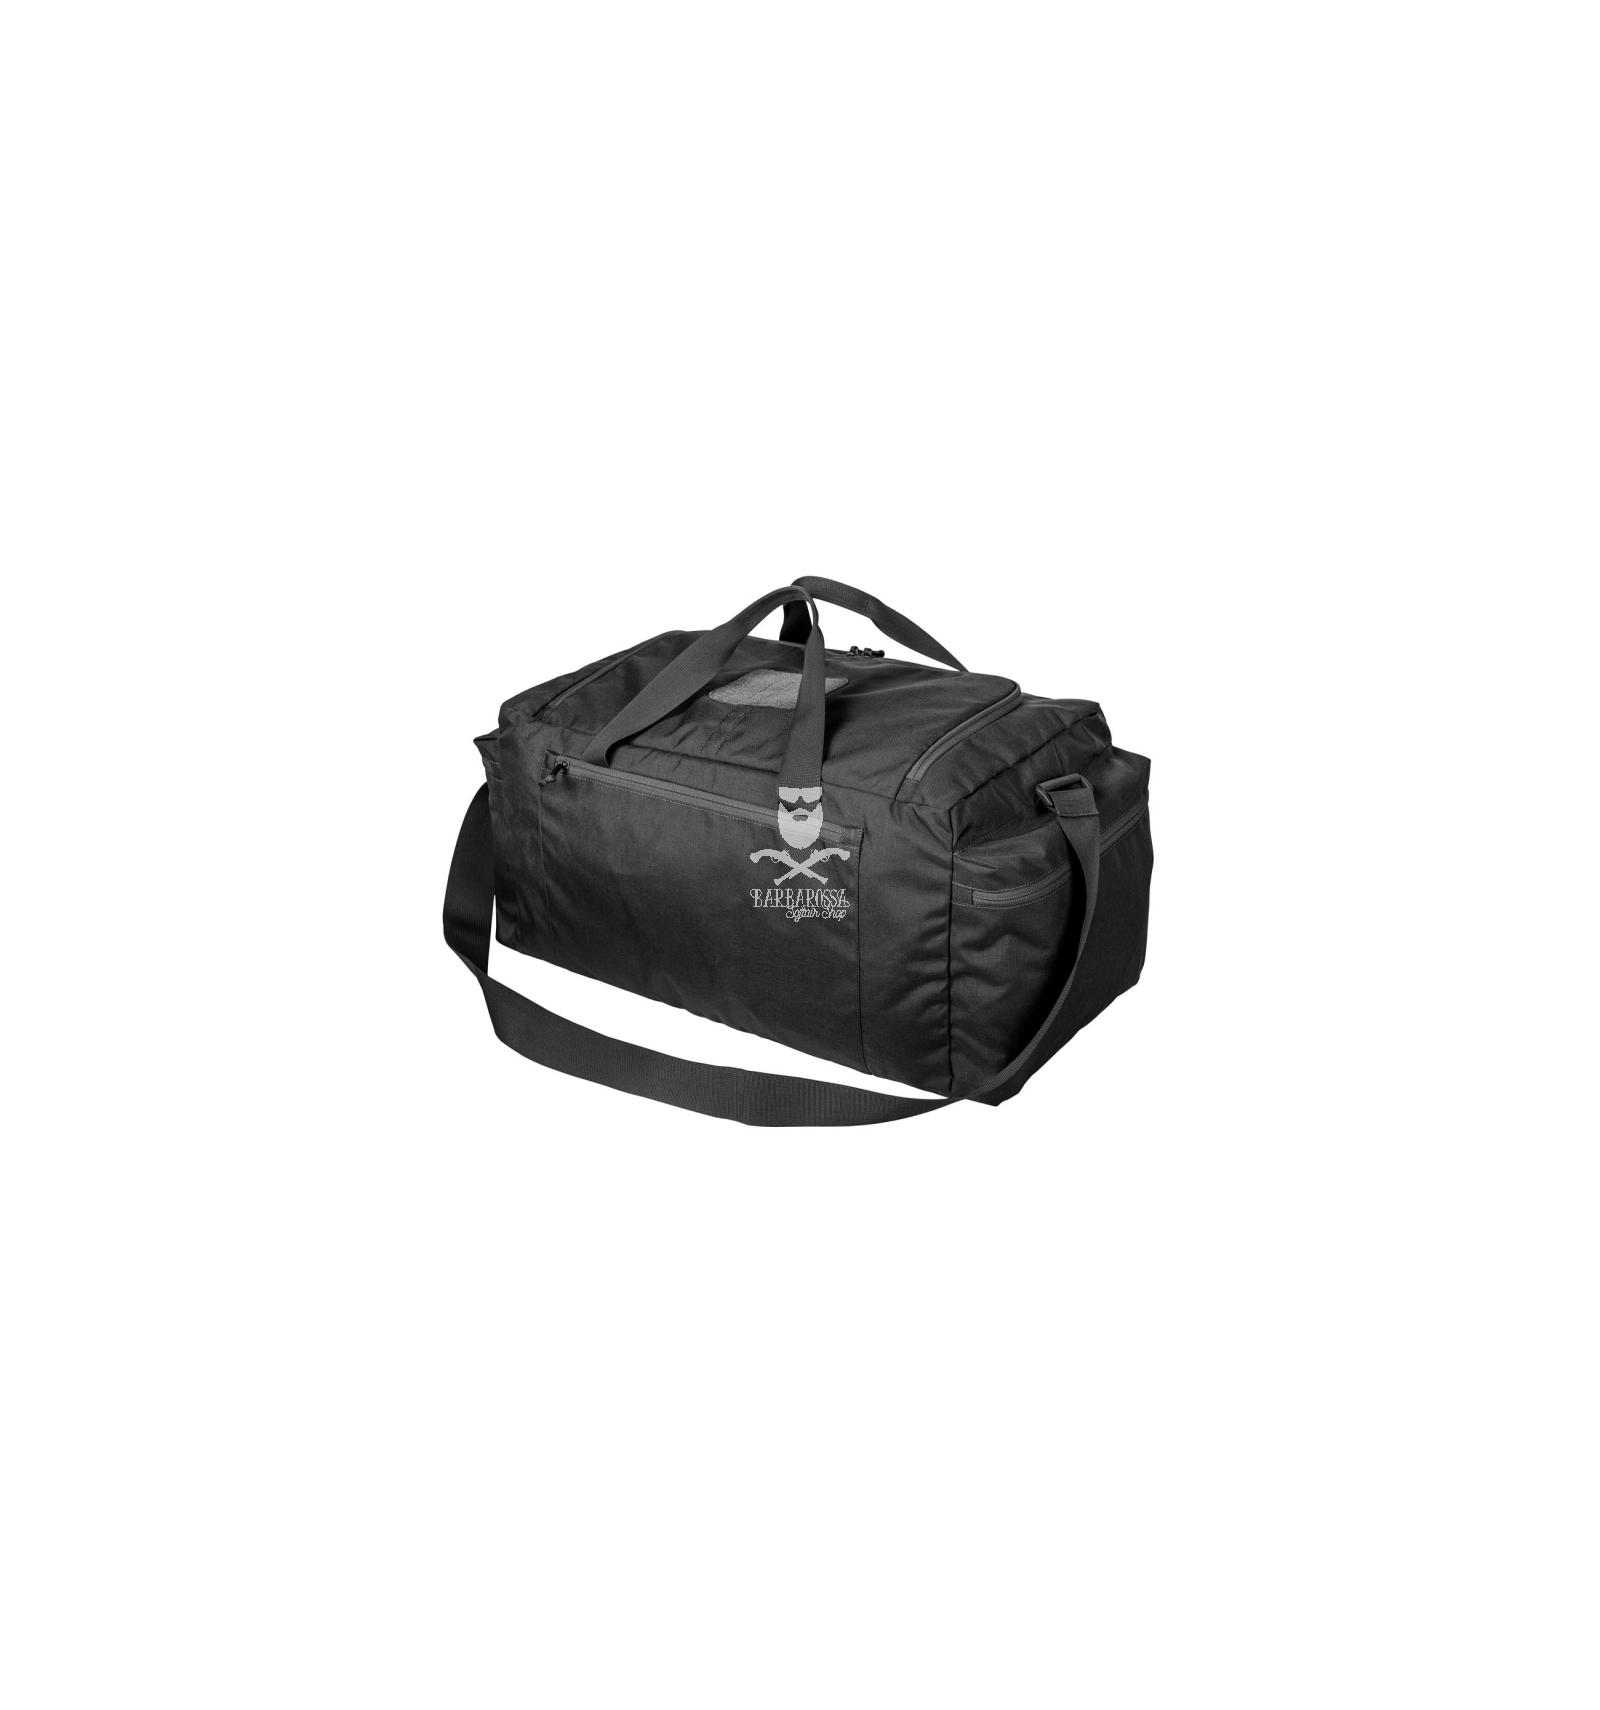 URBAN TRAINING BAG® - Black